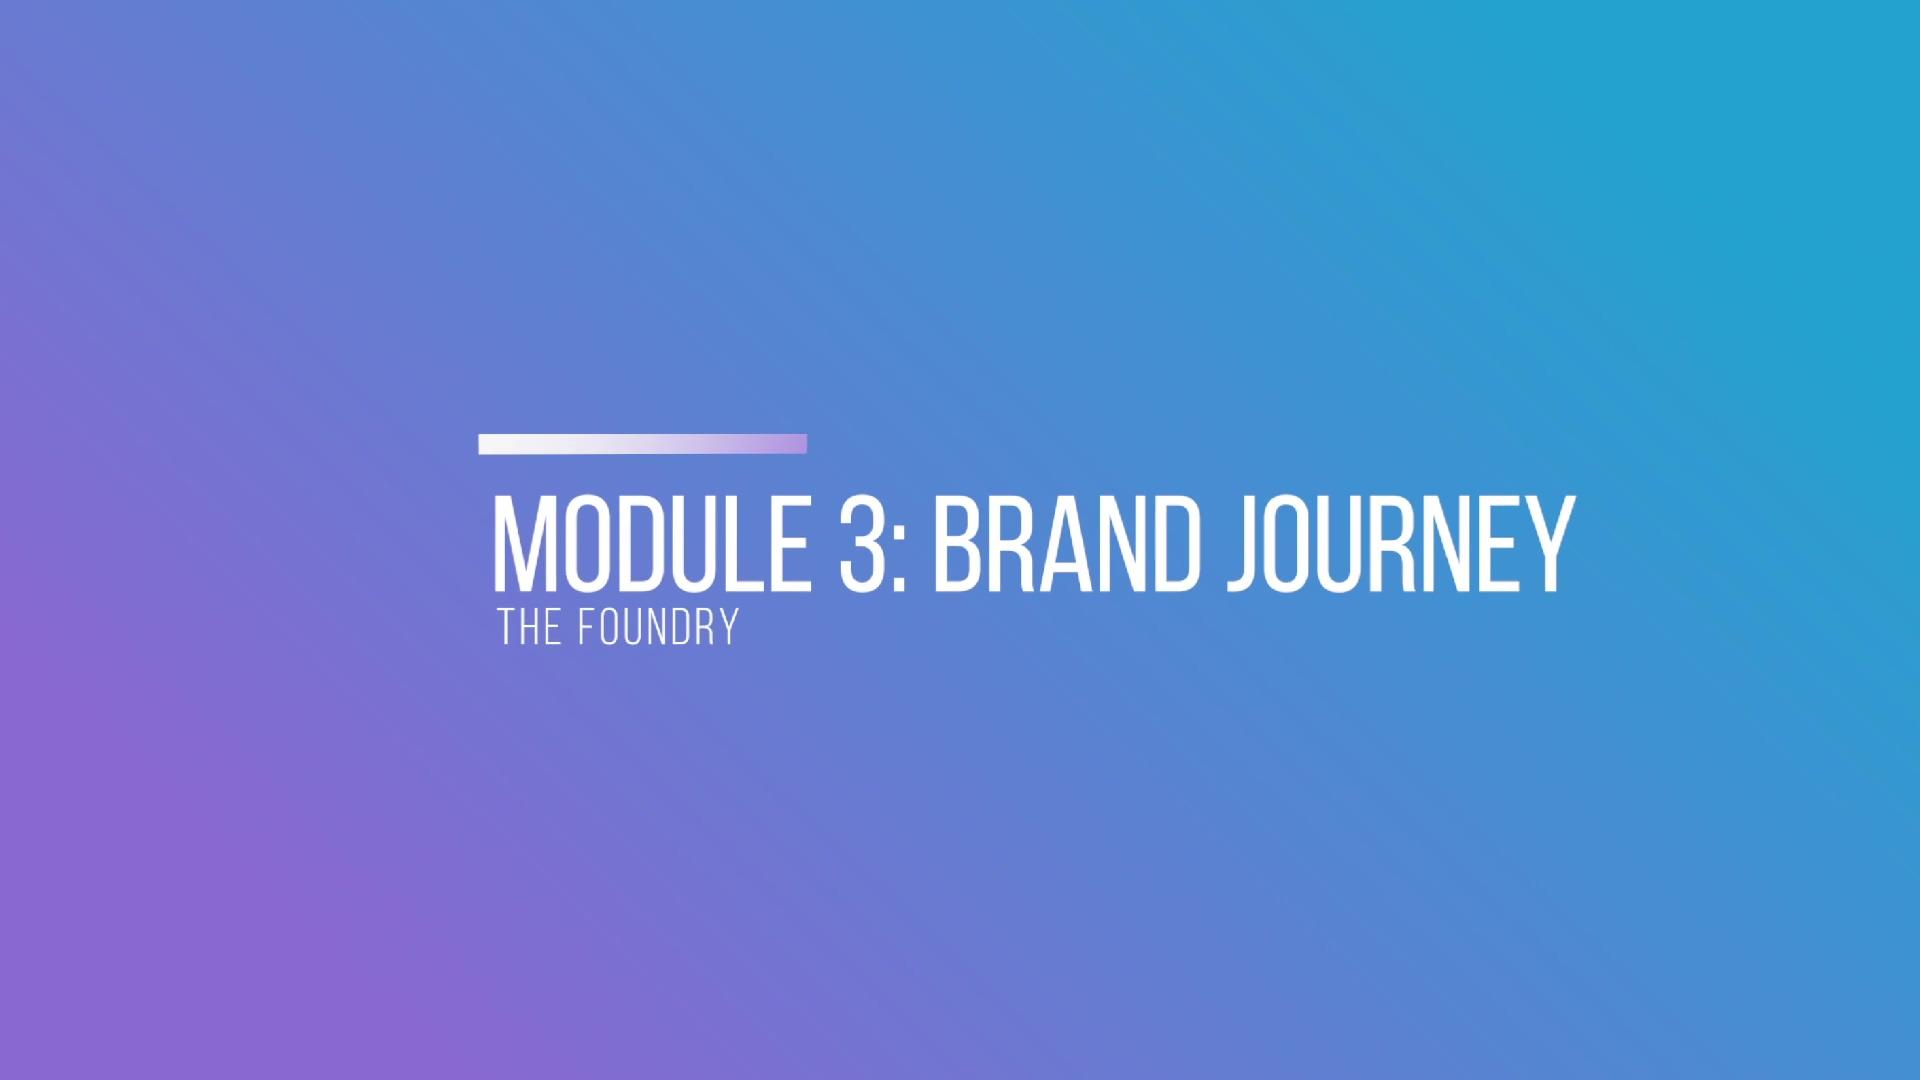 Module 3- Brand Journey